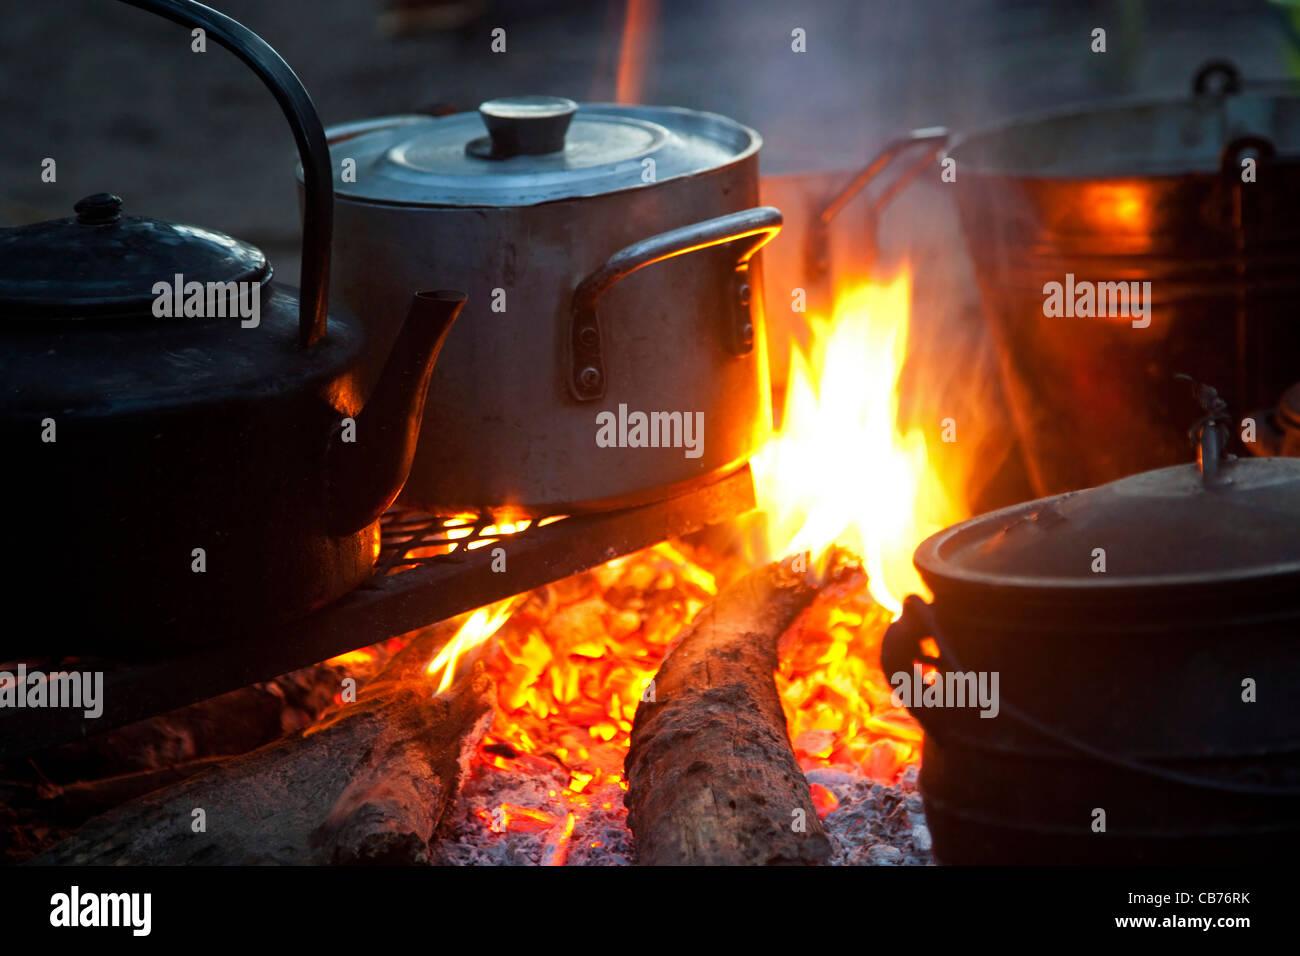 Boiling water in kettle and food cooking in metal pots on open wood fire, Okavango Delta, Botswana, Africa - Stock Image